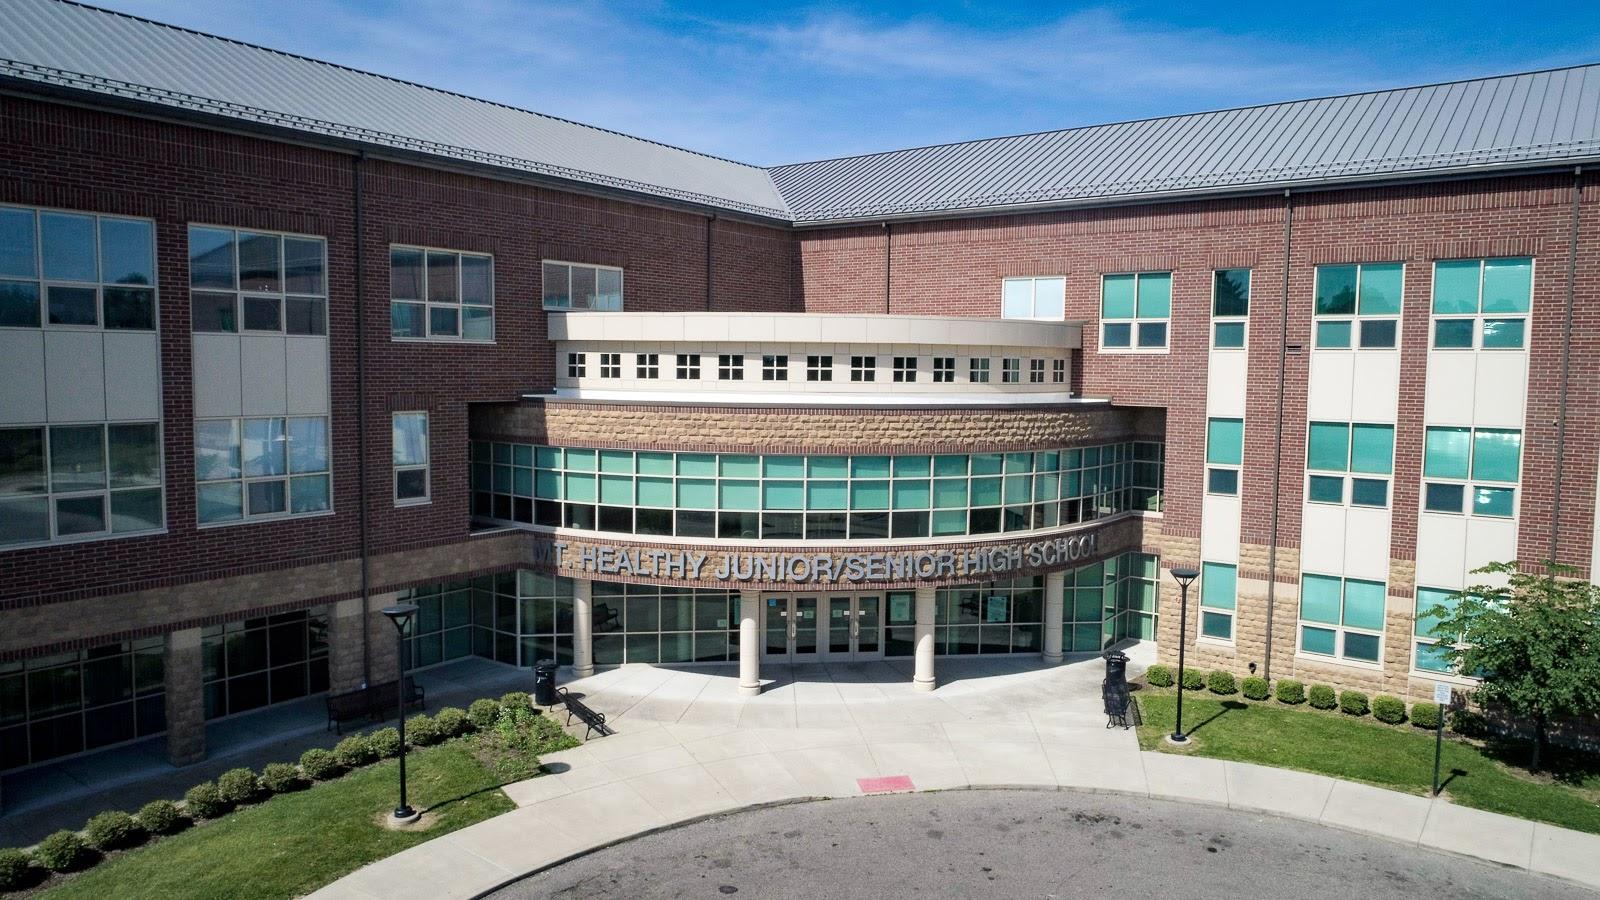 Jr/Sr High school photo